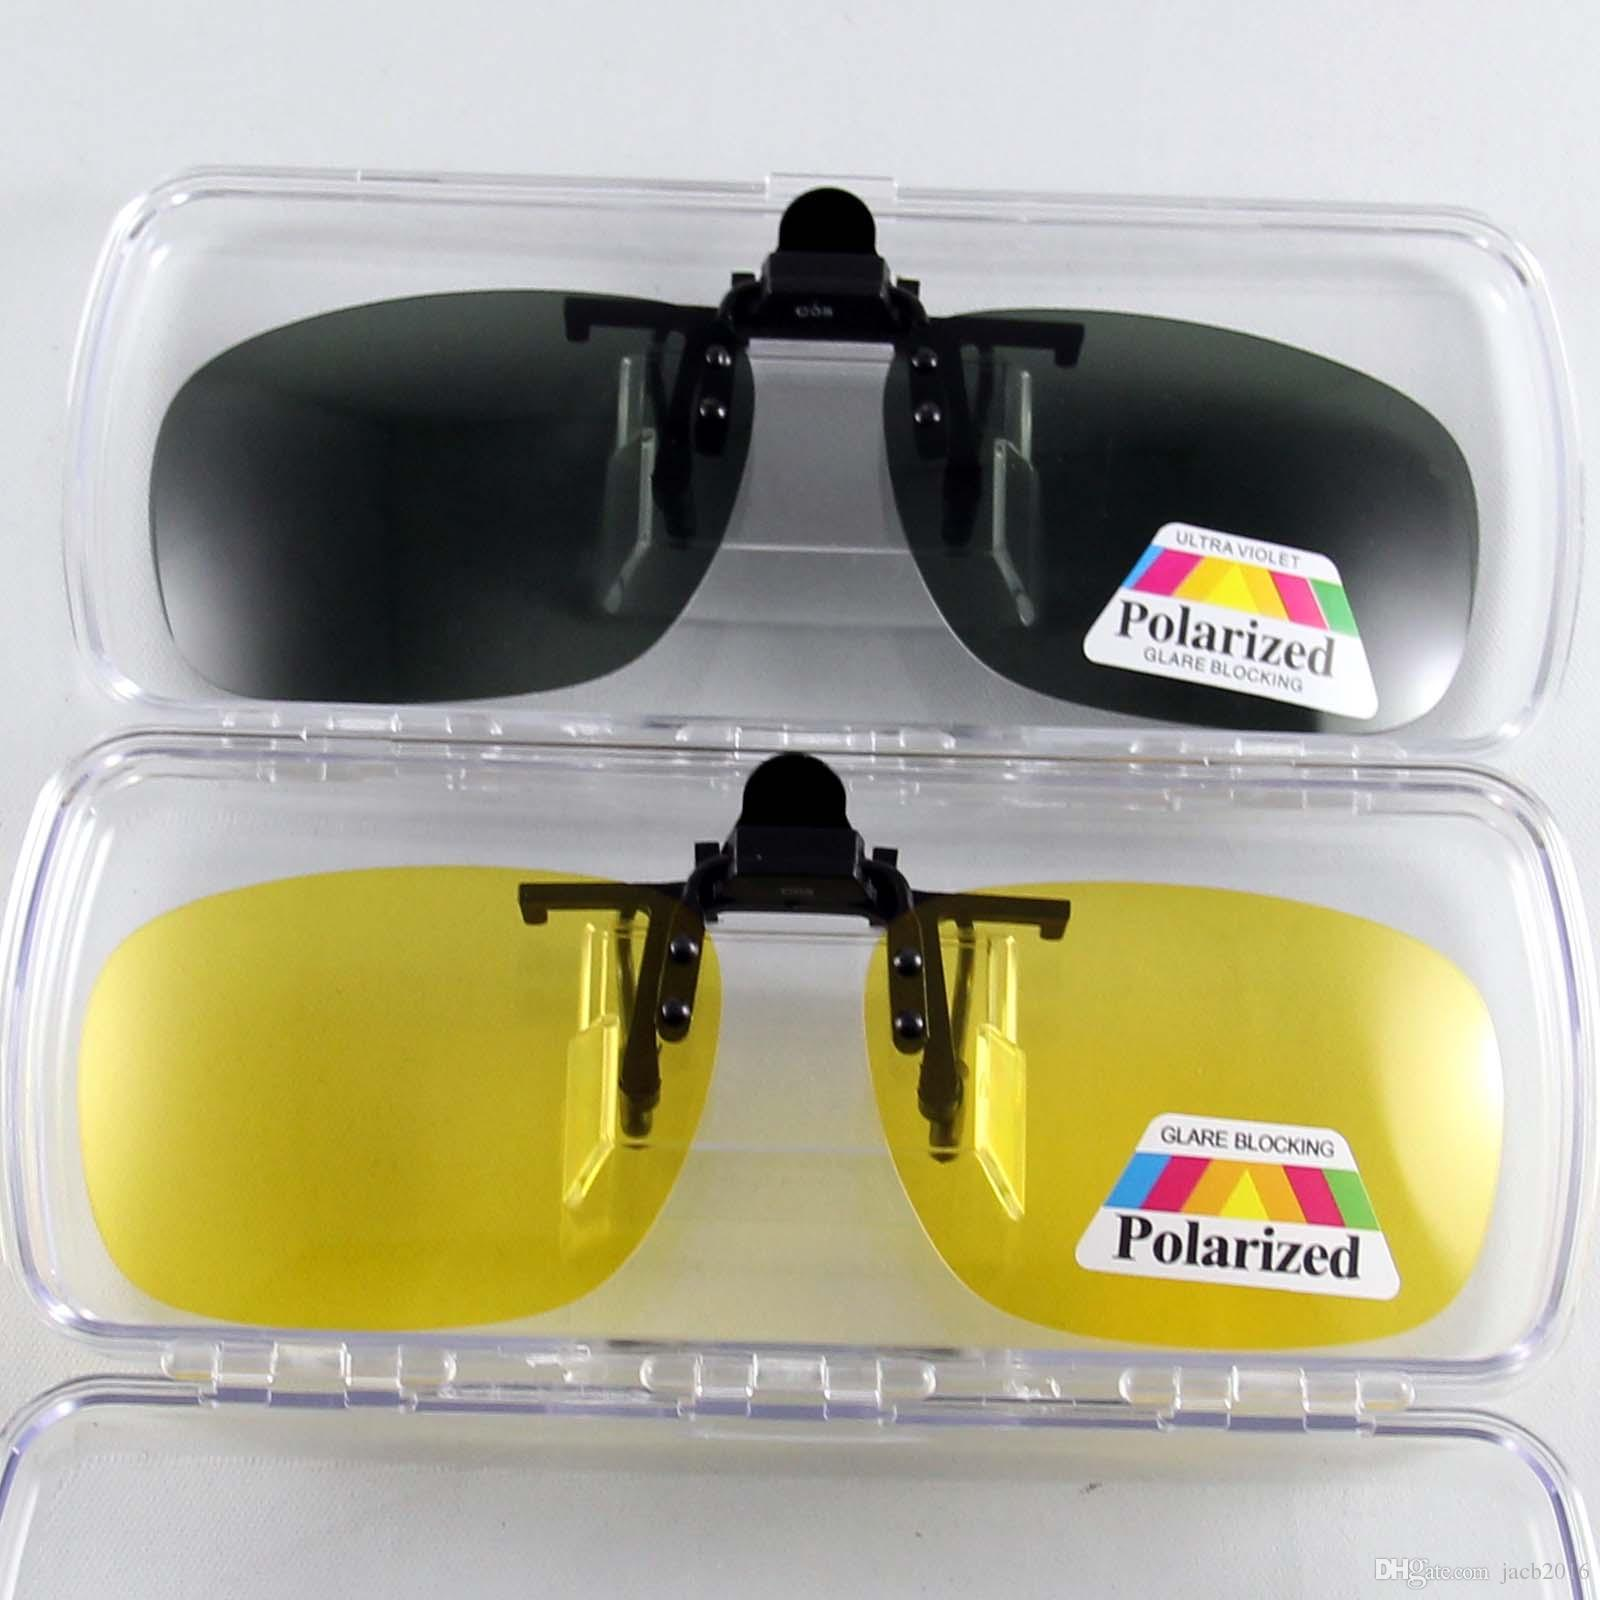 28cdb02bde4 Polarized Sunglasses Clip On Flip Up Sun Glasses Eyewear Eyeglasses Shade  Shield Anti Reflective UV Protect Fishing Driving Black Sunglasses Cycling  ...